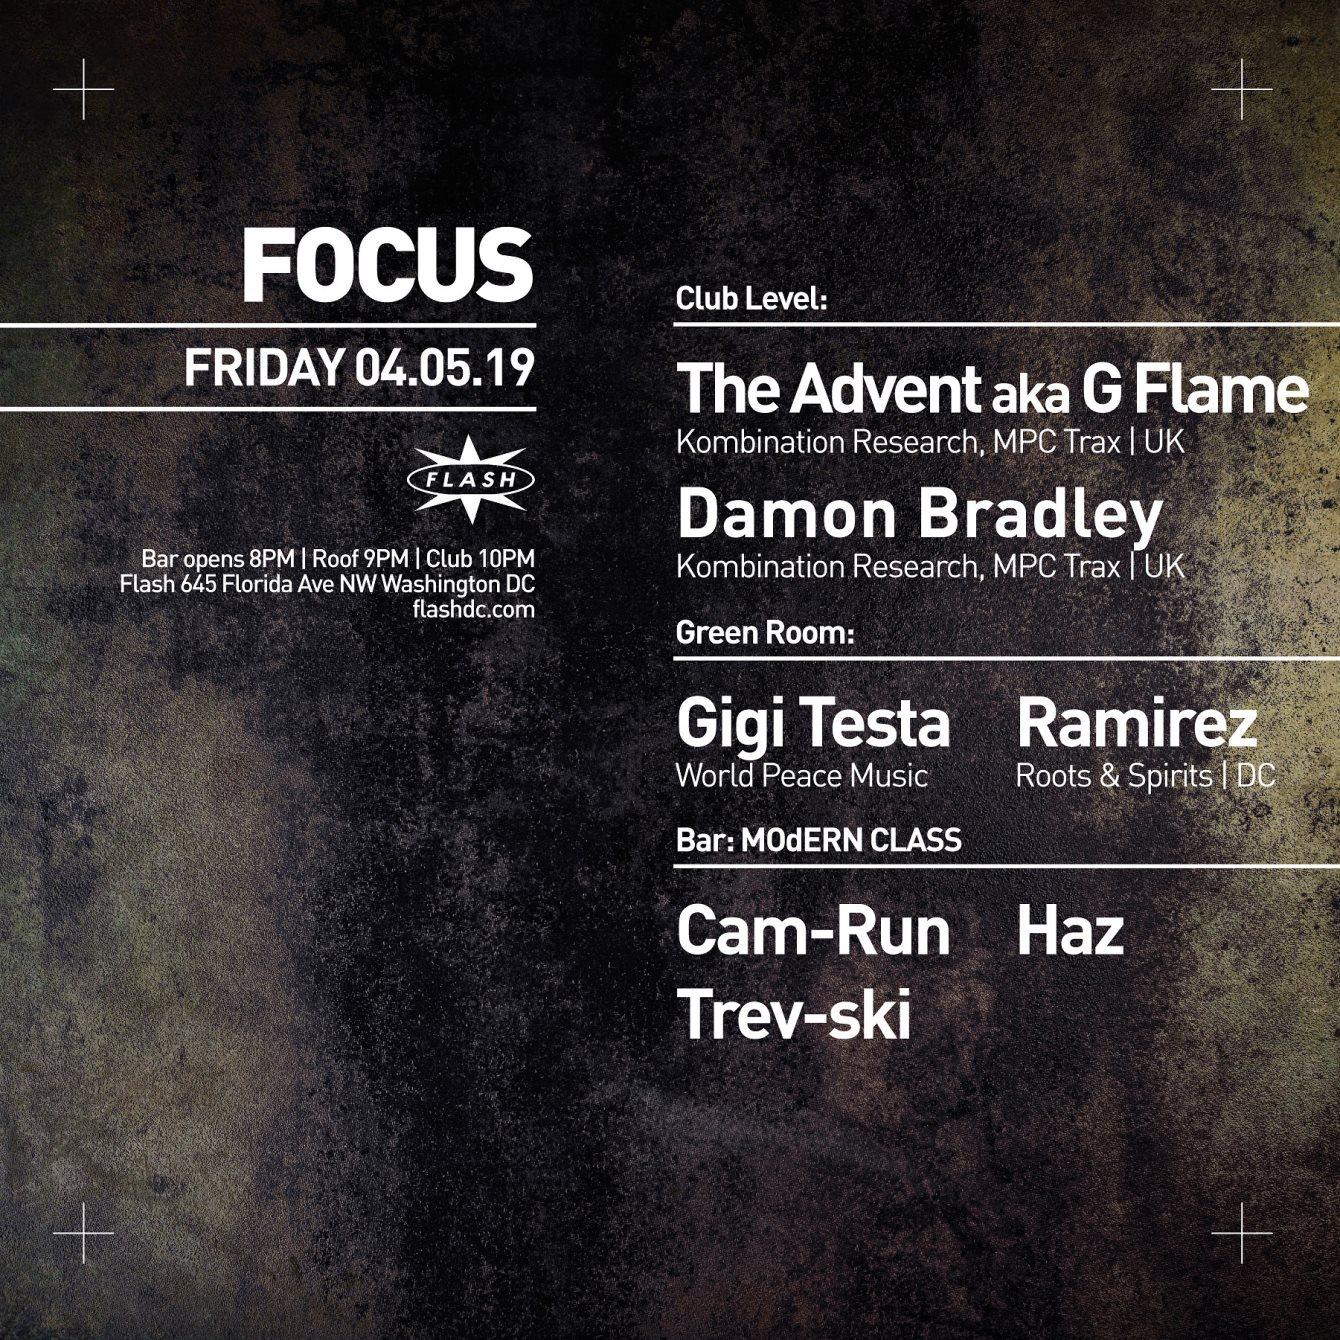 Focus: The Advent aka G Flame - Damon Bradley - Flyer back